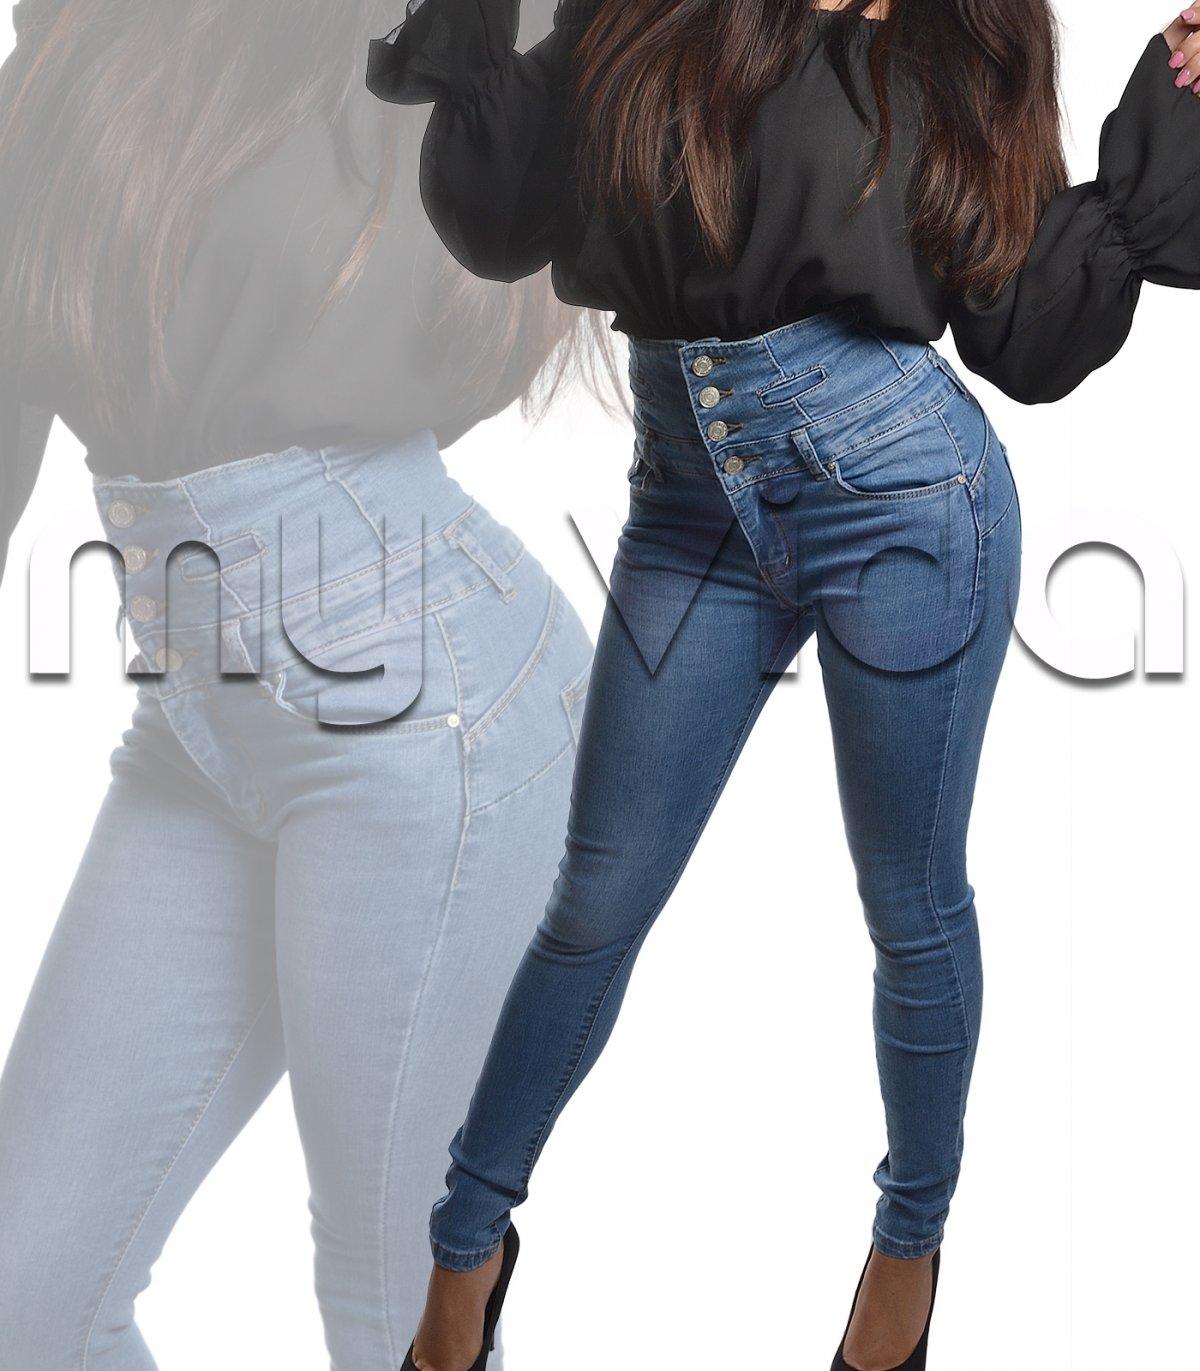 40a62ac3dc Jeans donna cinque tasche vita alta   My Vida